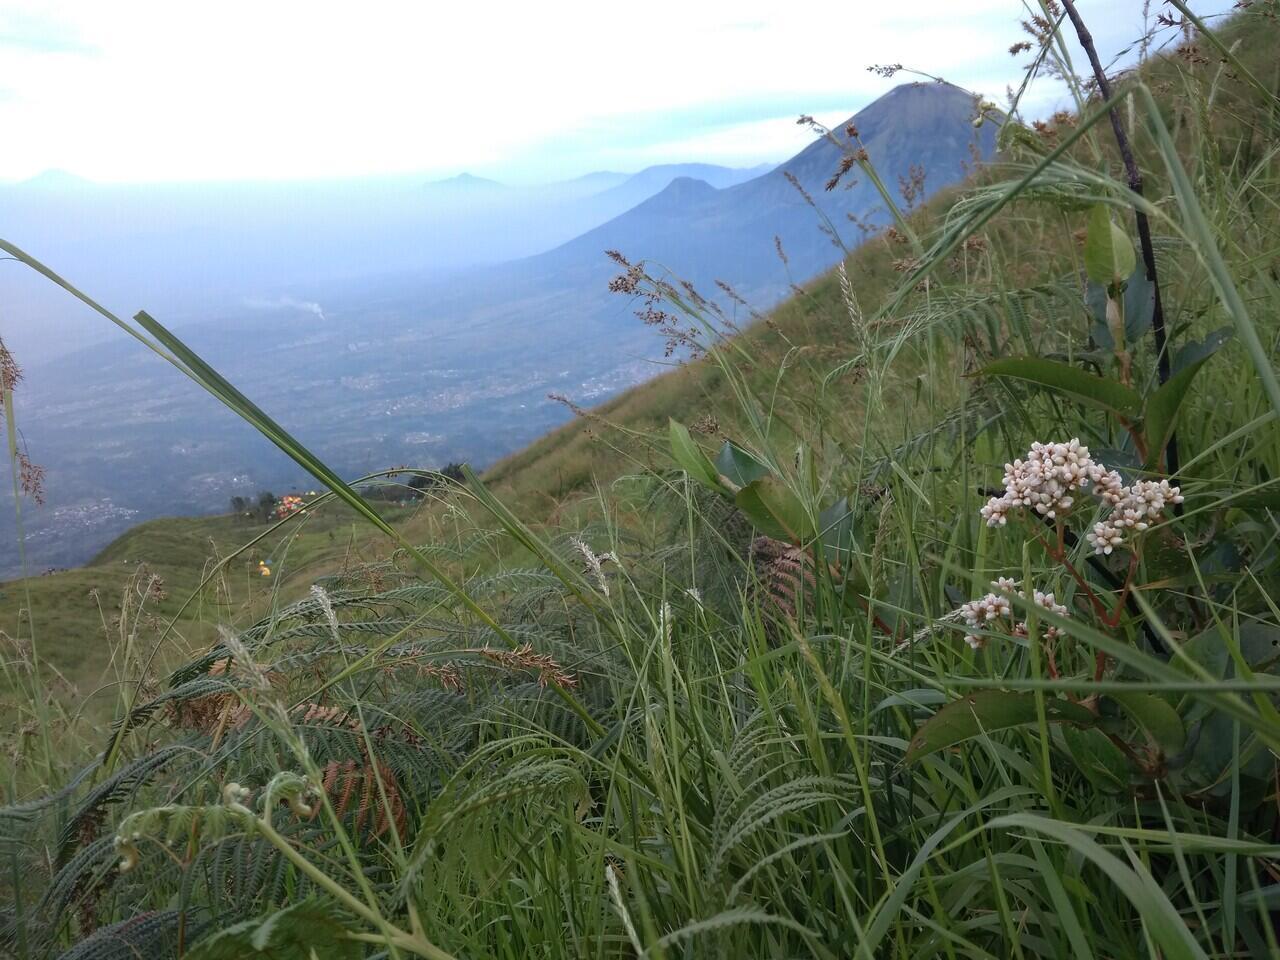 Cerita pengalaman ikut open trip mendaki gunung Sumbing.